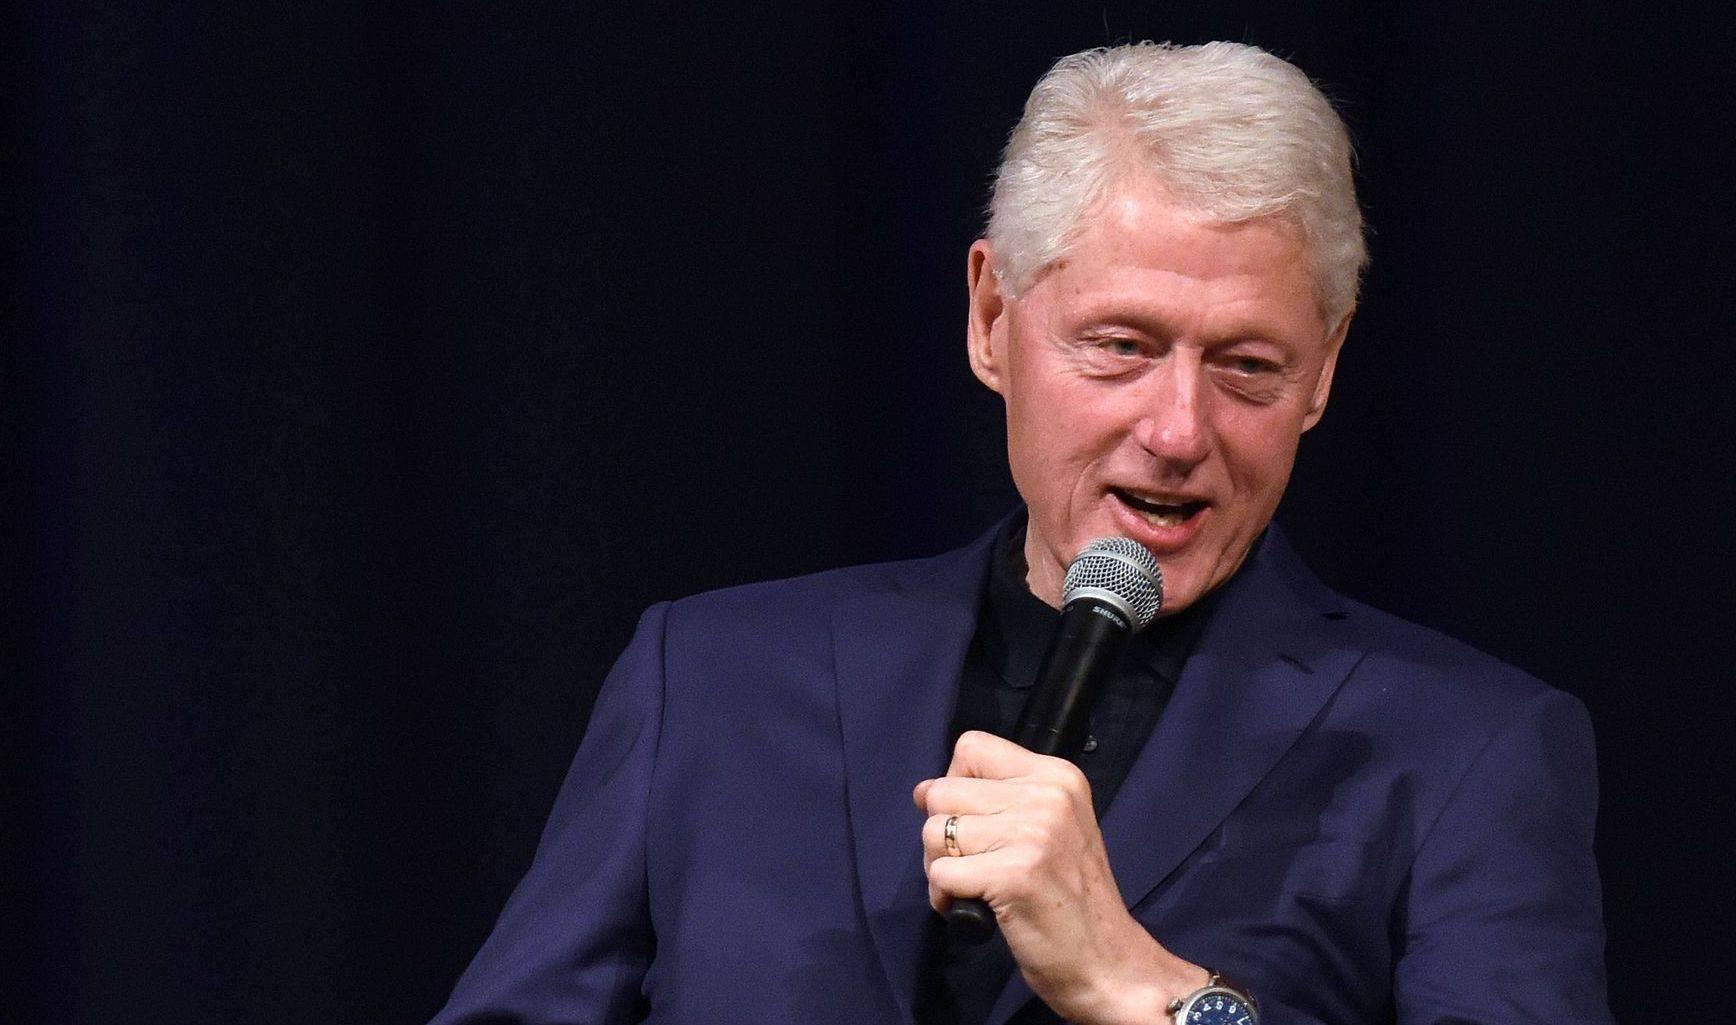 The net worth of Bill Clinton